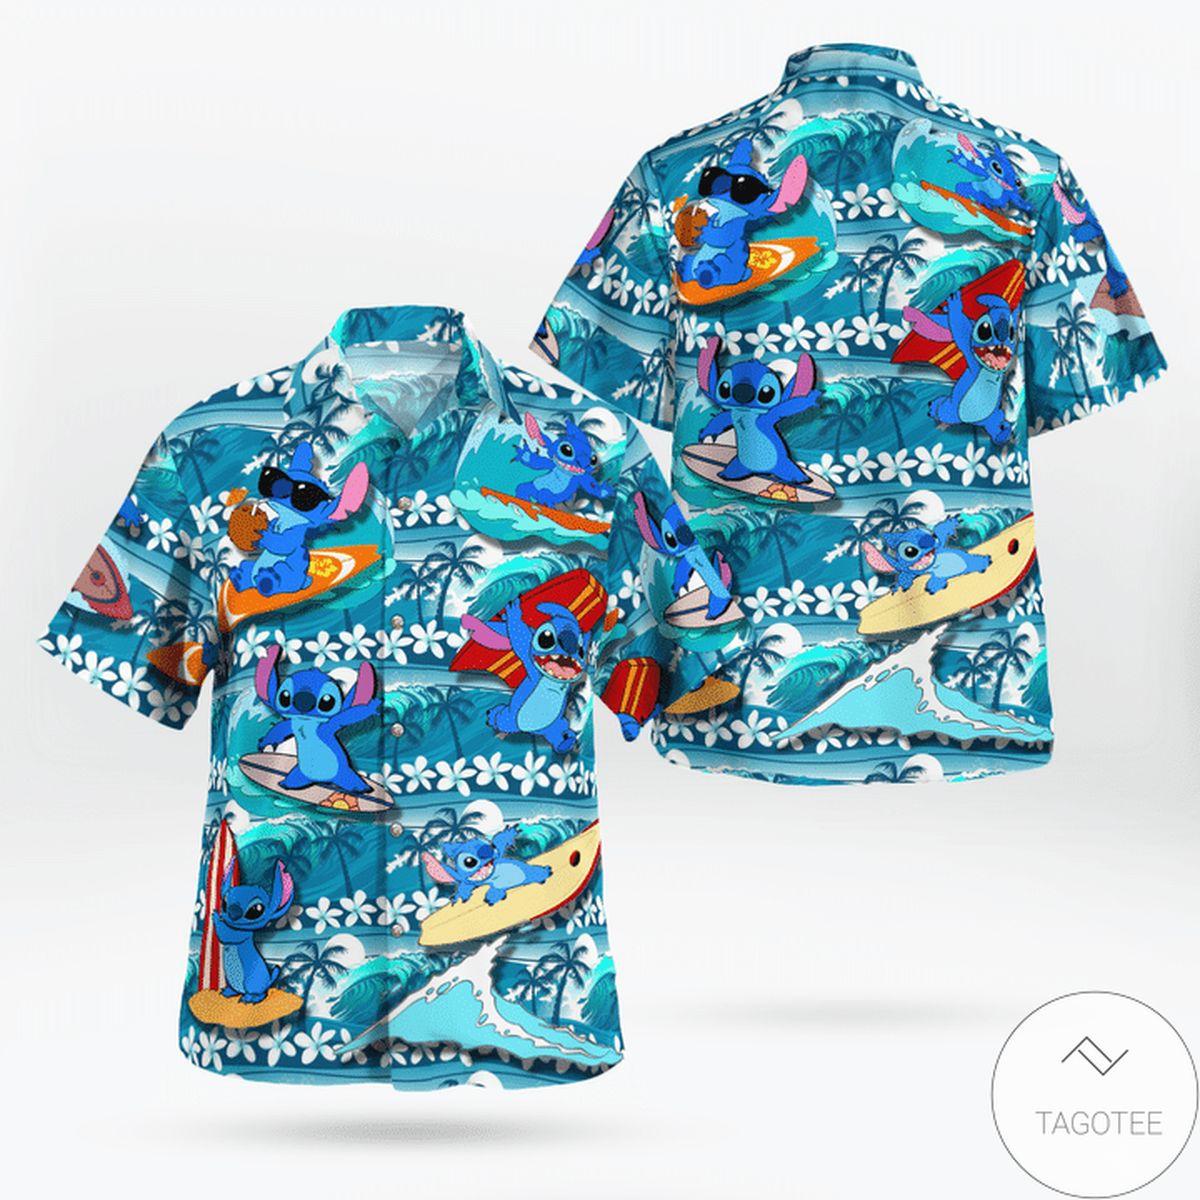 Vibrant Catching Waves Soakin' Ray Stich Funny Sulfing Hawaiian Shirt